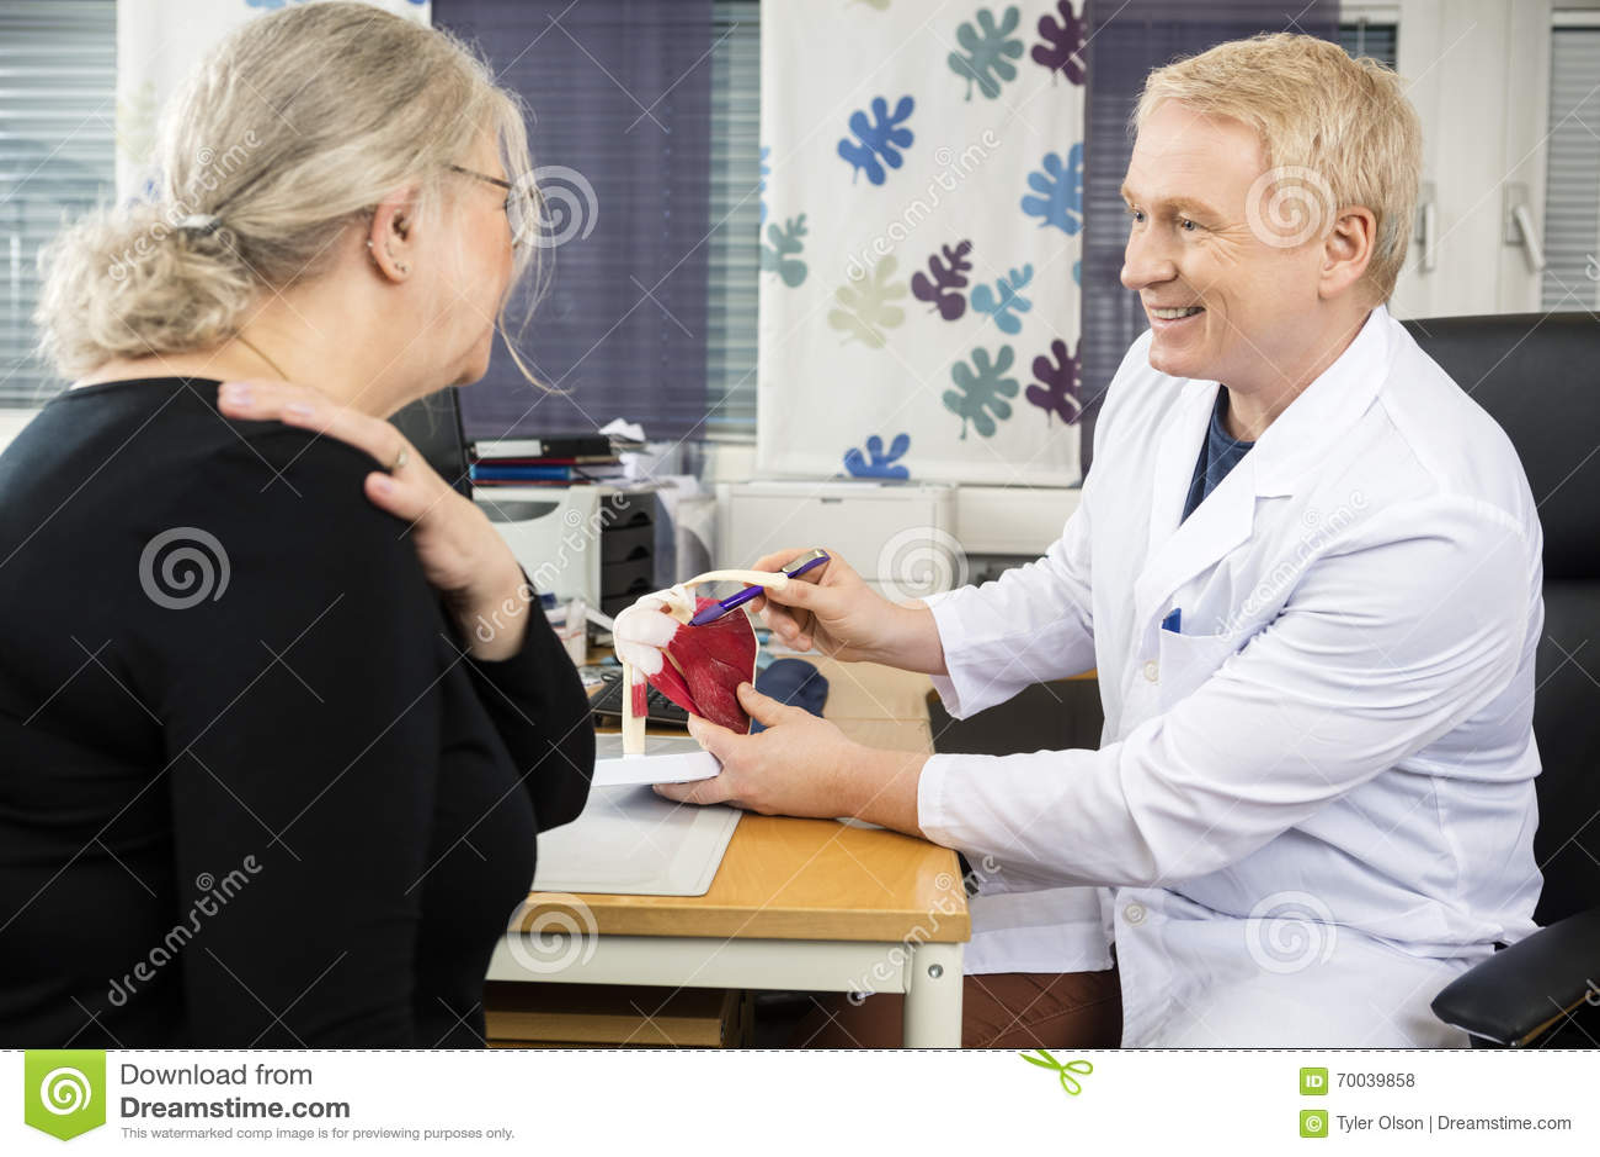 Modelo While Explaining del puño de rotor del doctor Pointing At Shoulder